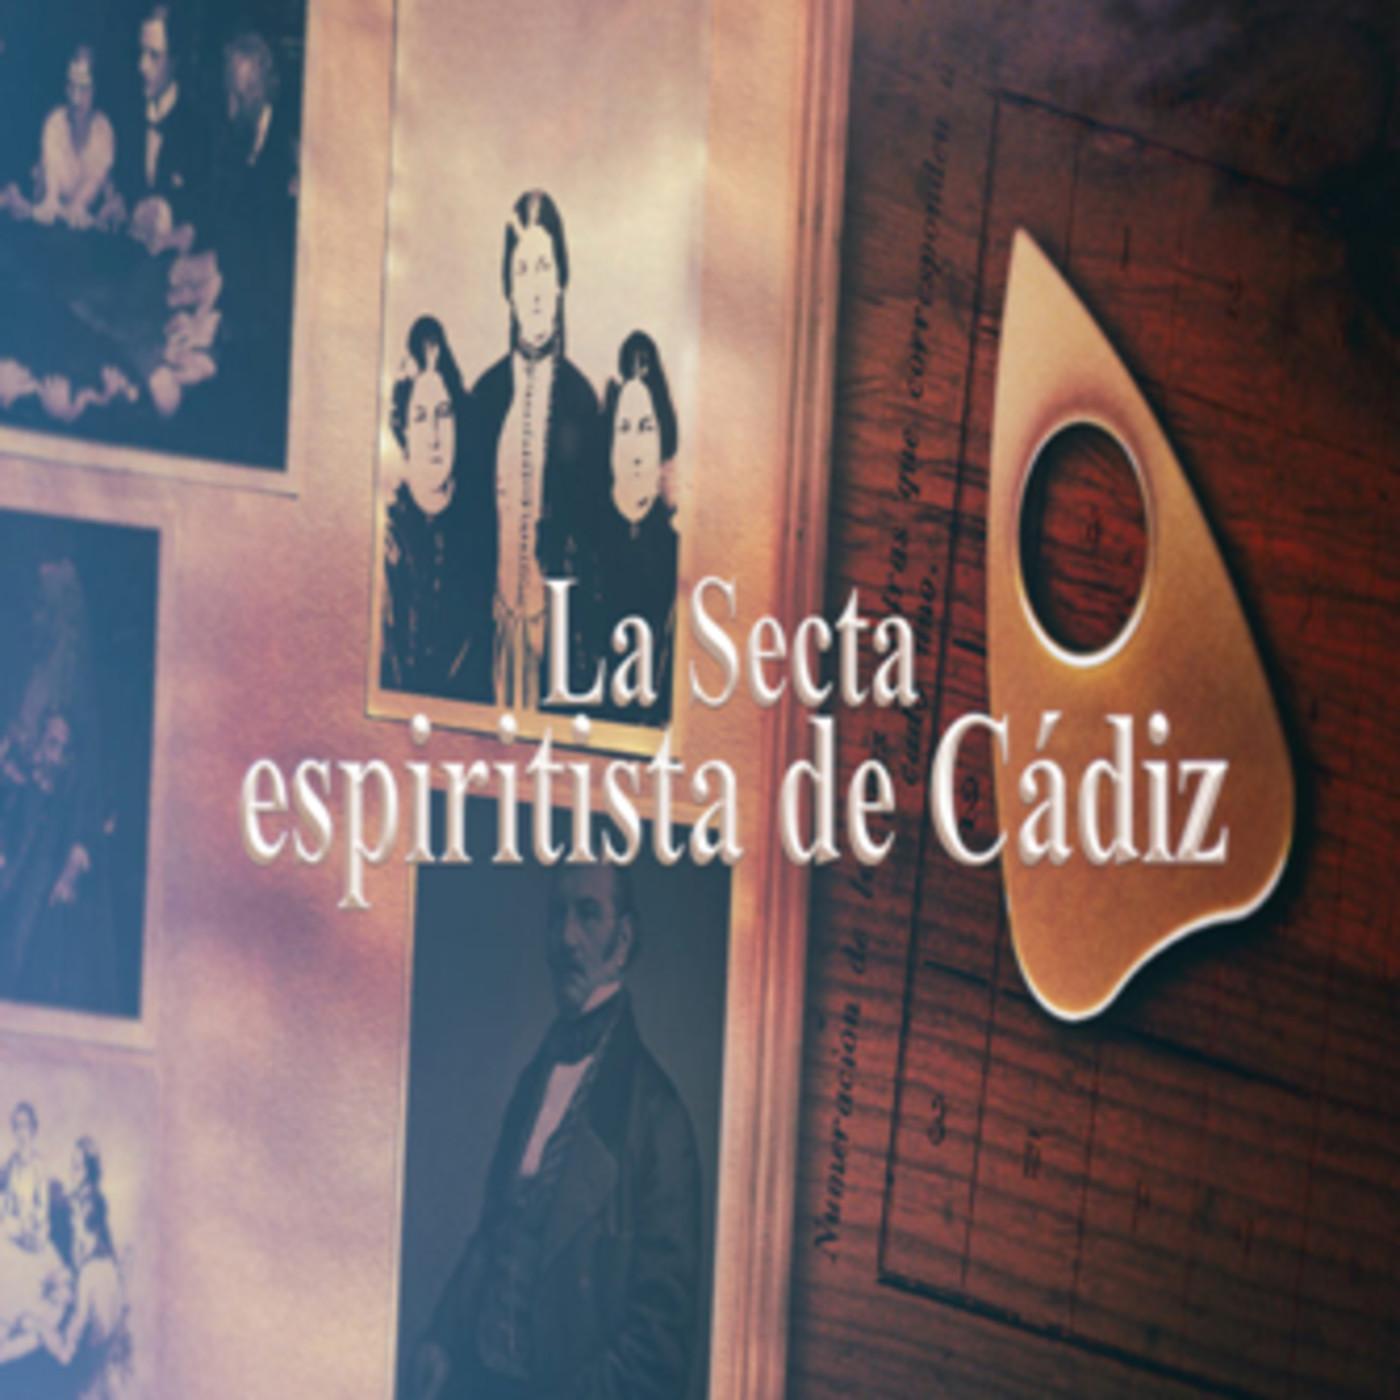 Cuarto Milenio: La secta espiritista de Cádiz en Cuarto ...